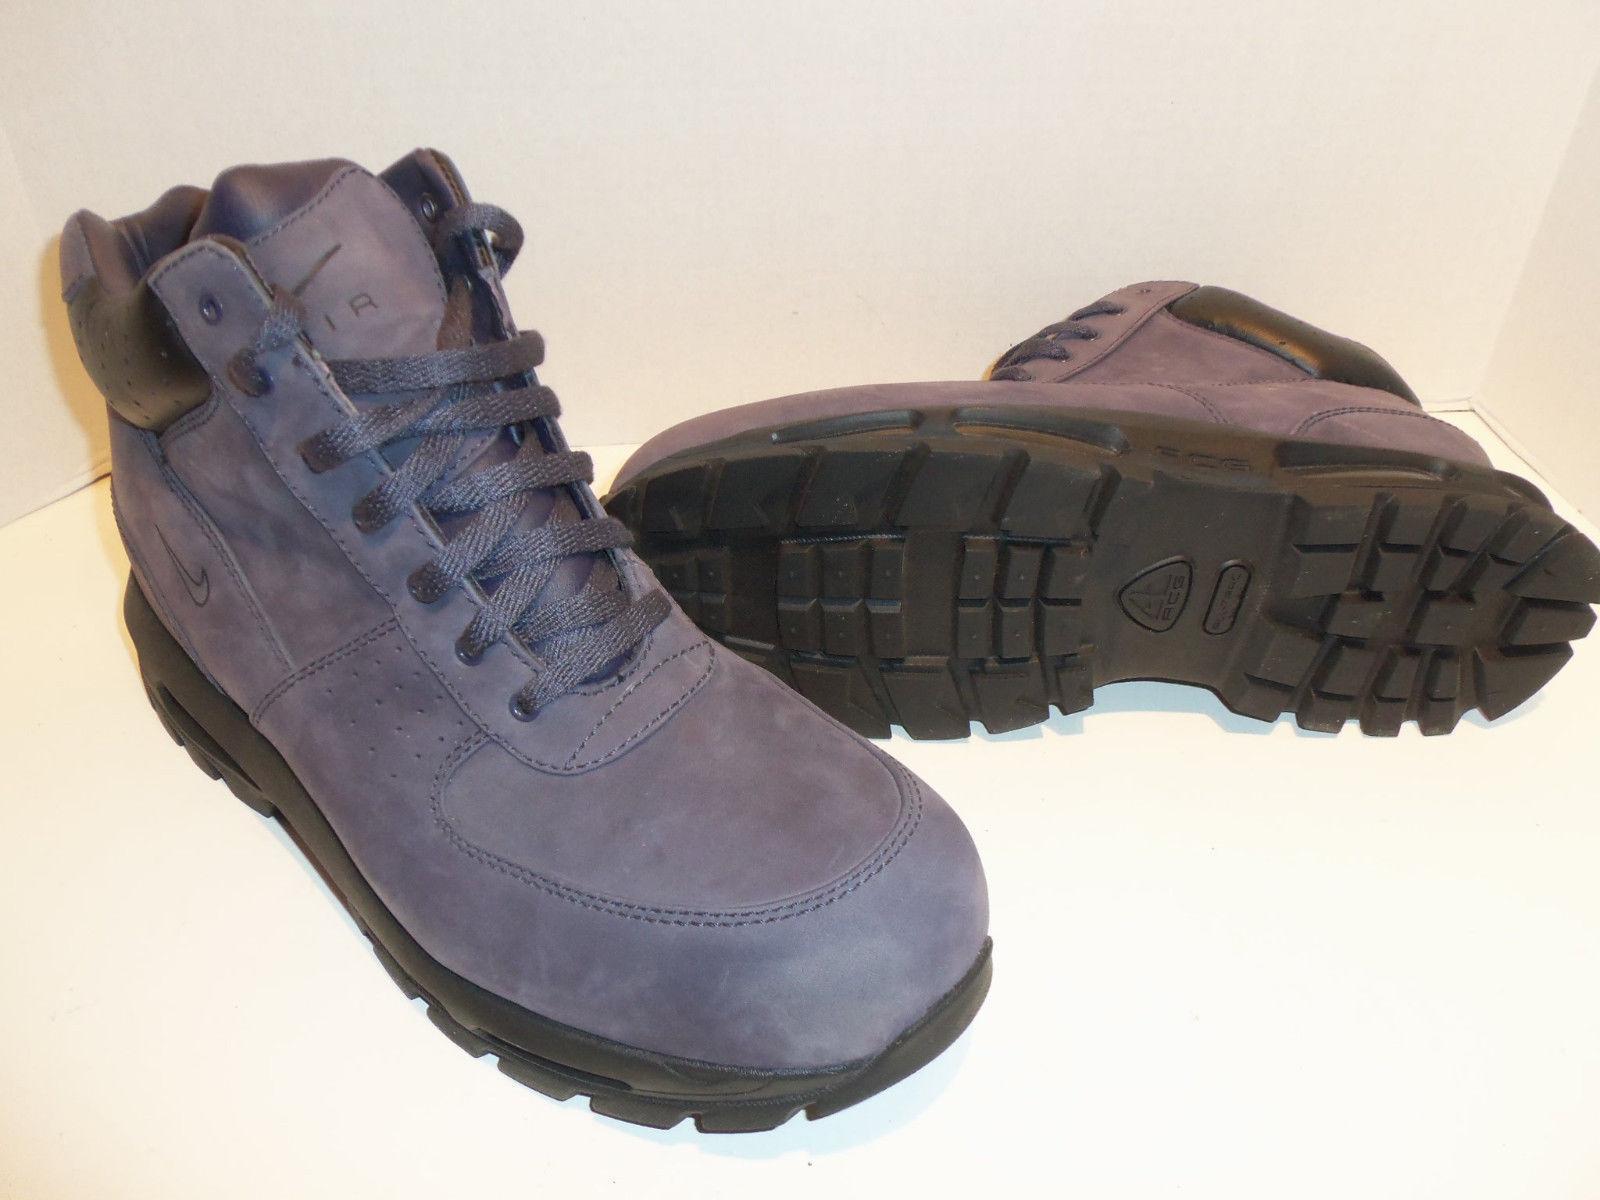 innovative design b87c4 ce125 nike foamposite air max acg goadome boots